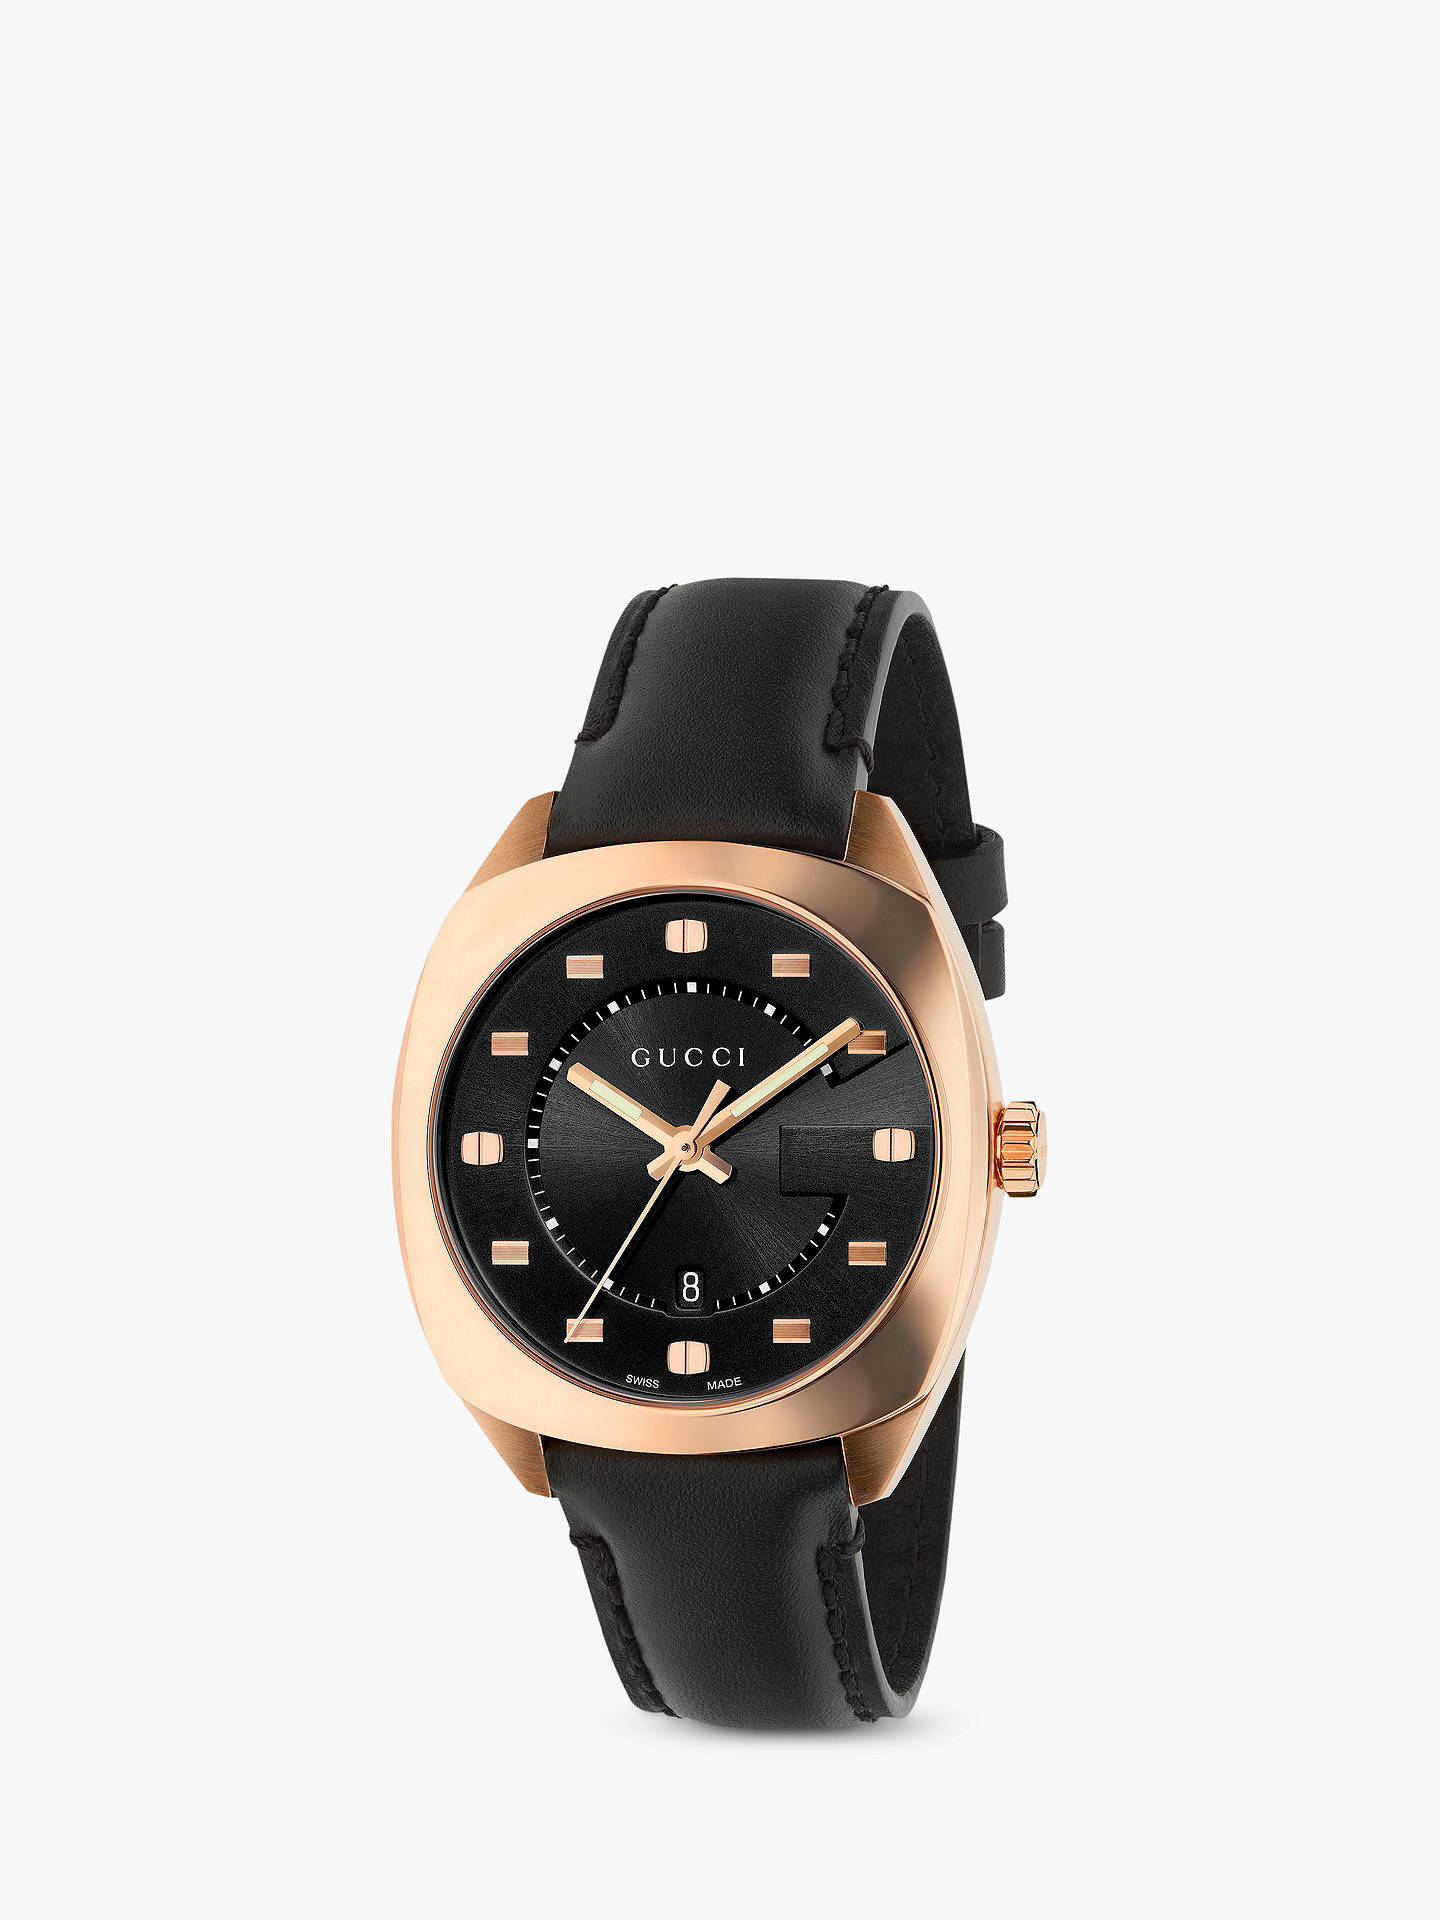 5dae95a6ef6 Buy Gucci YA142407 Women s GG2570 Date Leather Strap Watch